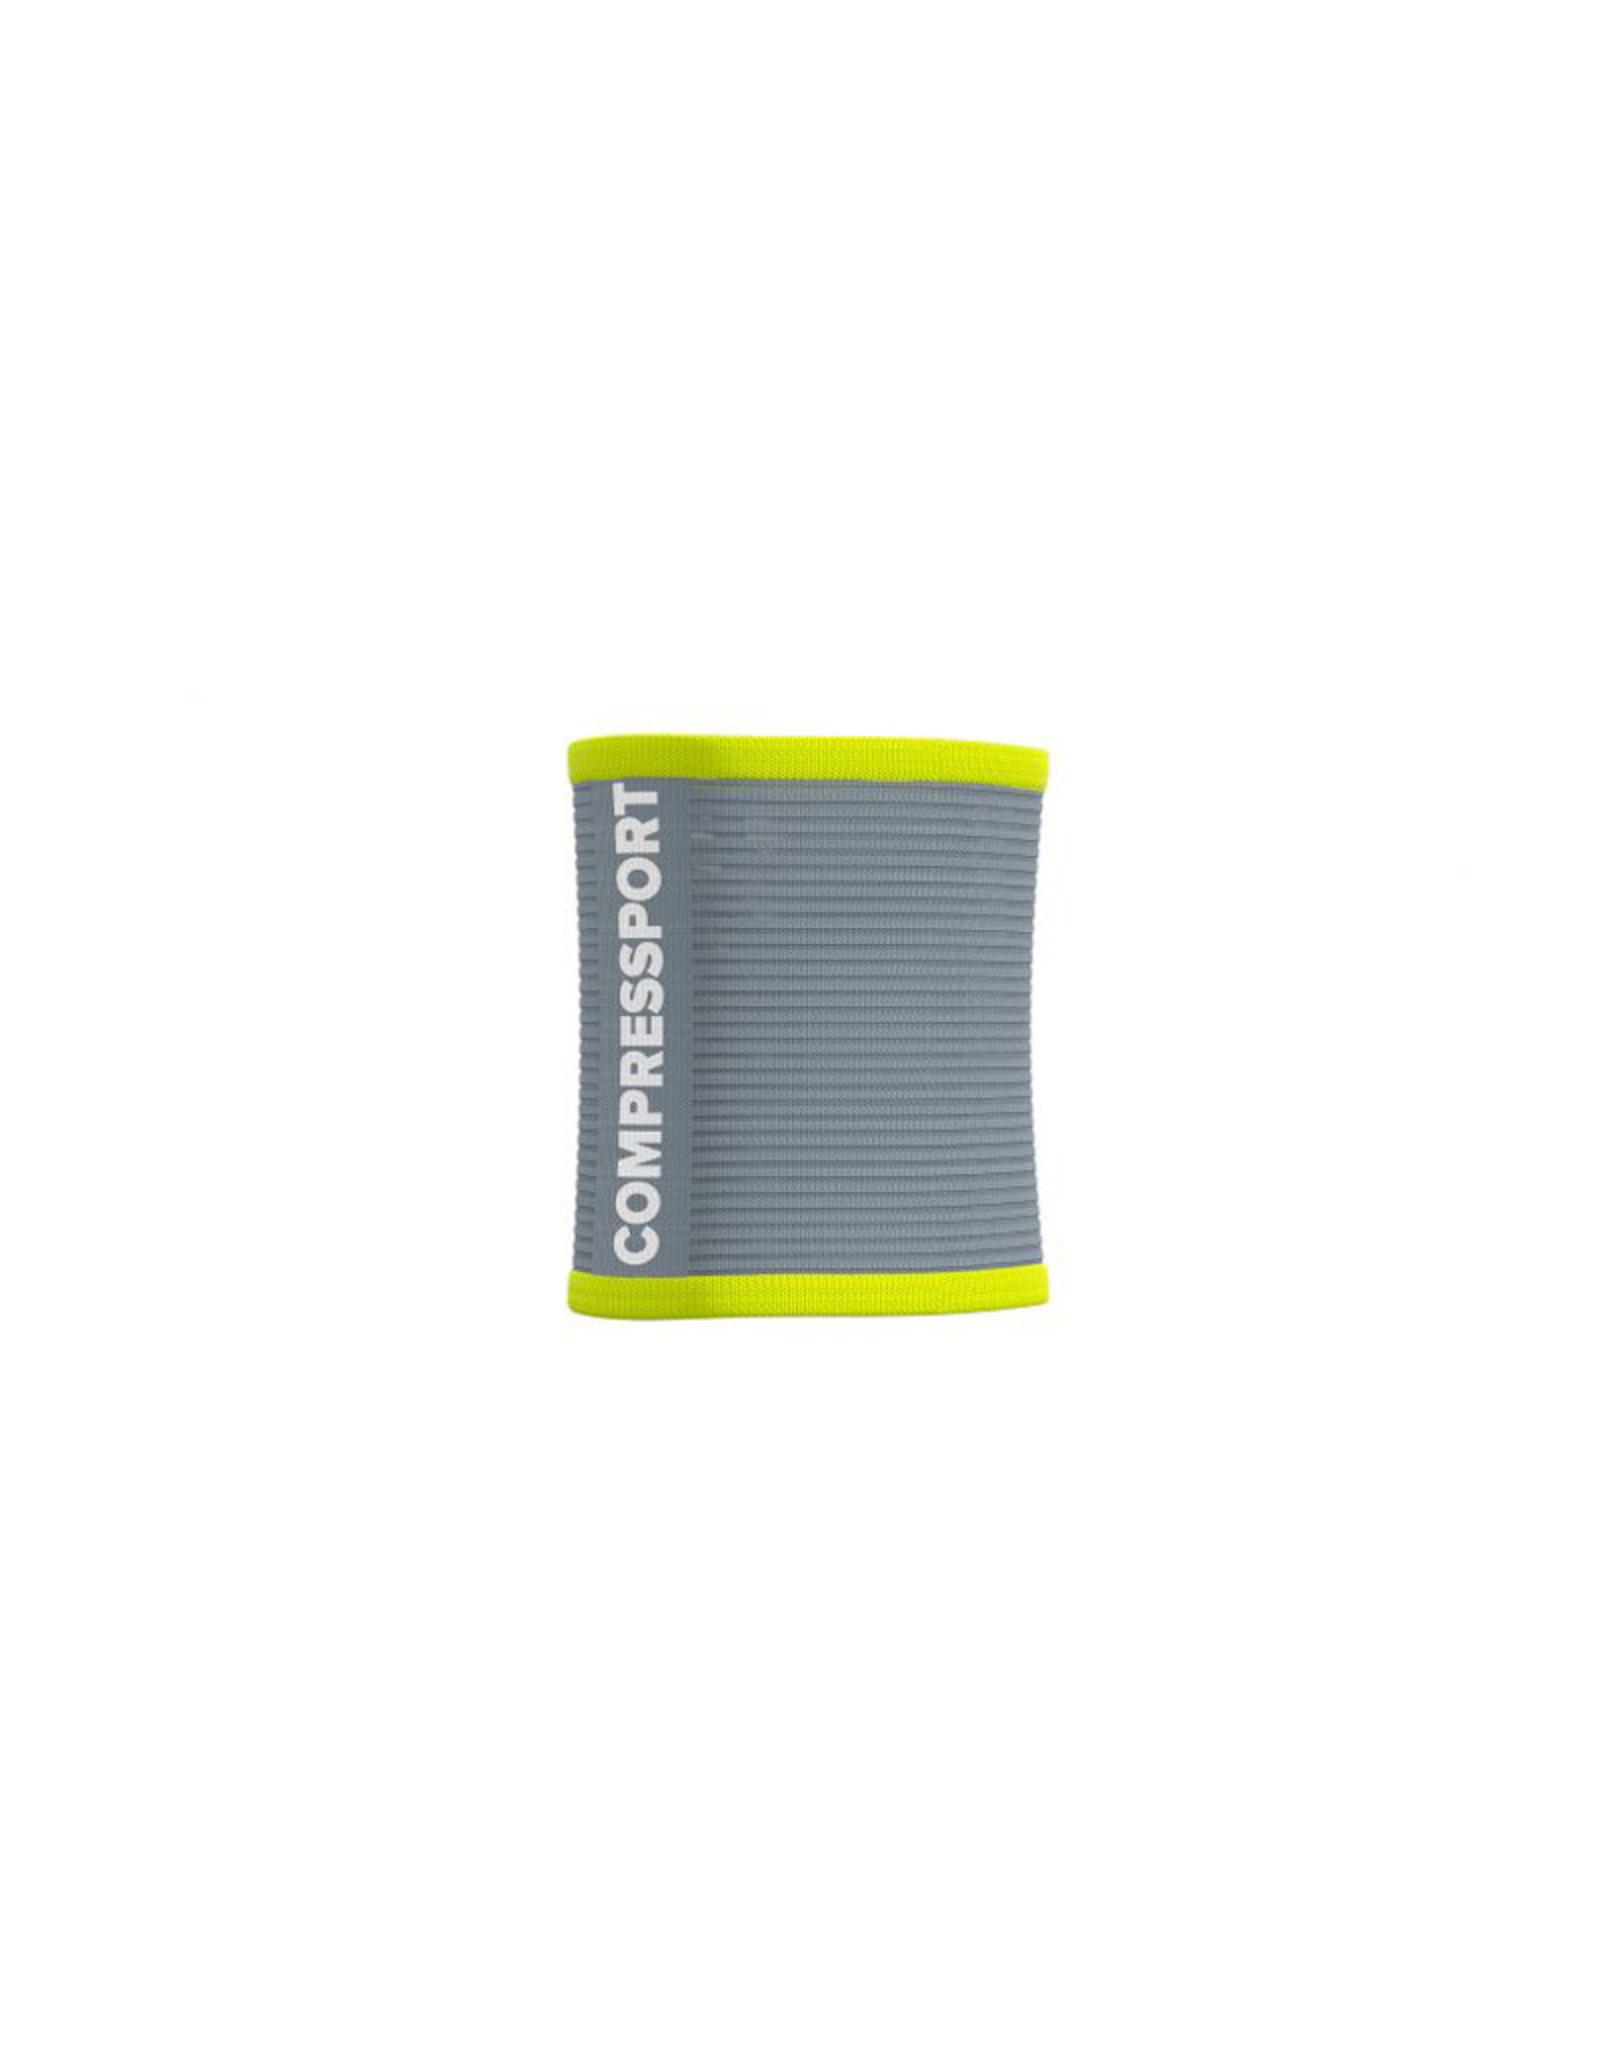 Compressport Sweatbands 3D.Dots - Grijs/Geel